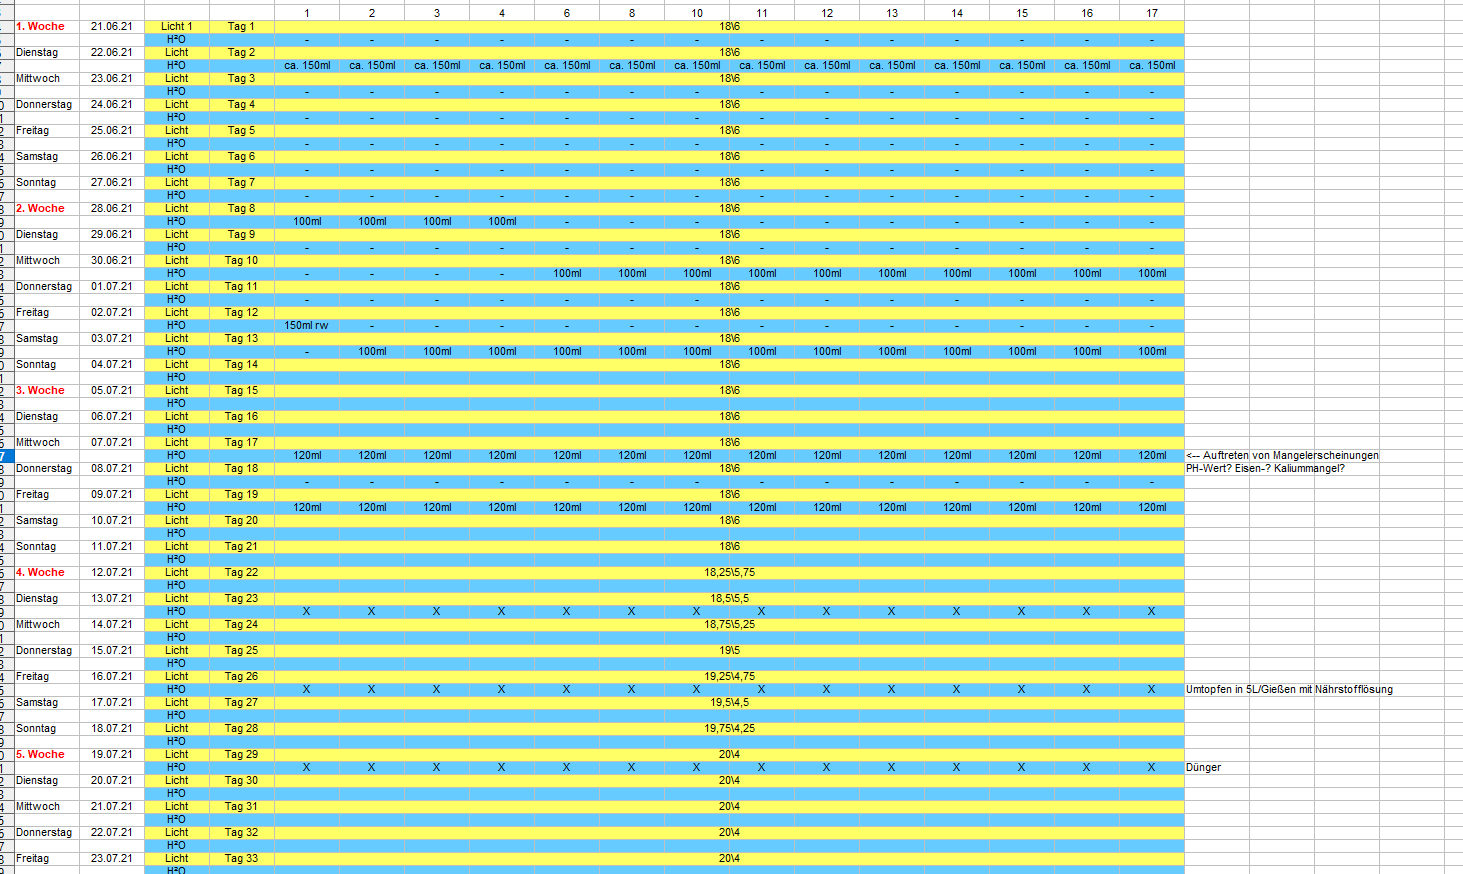 Screenshot 2021-07-20 172715